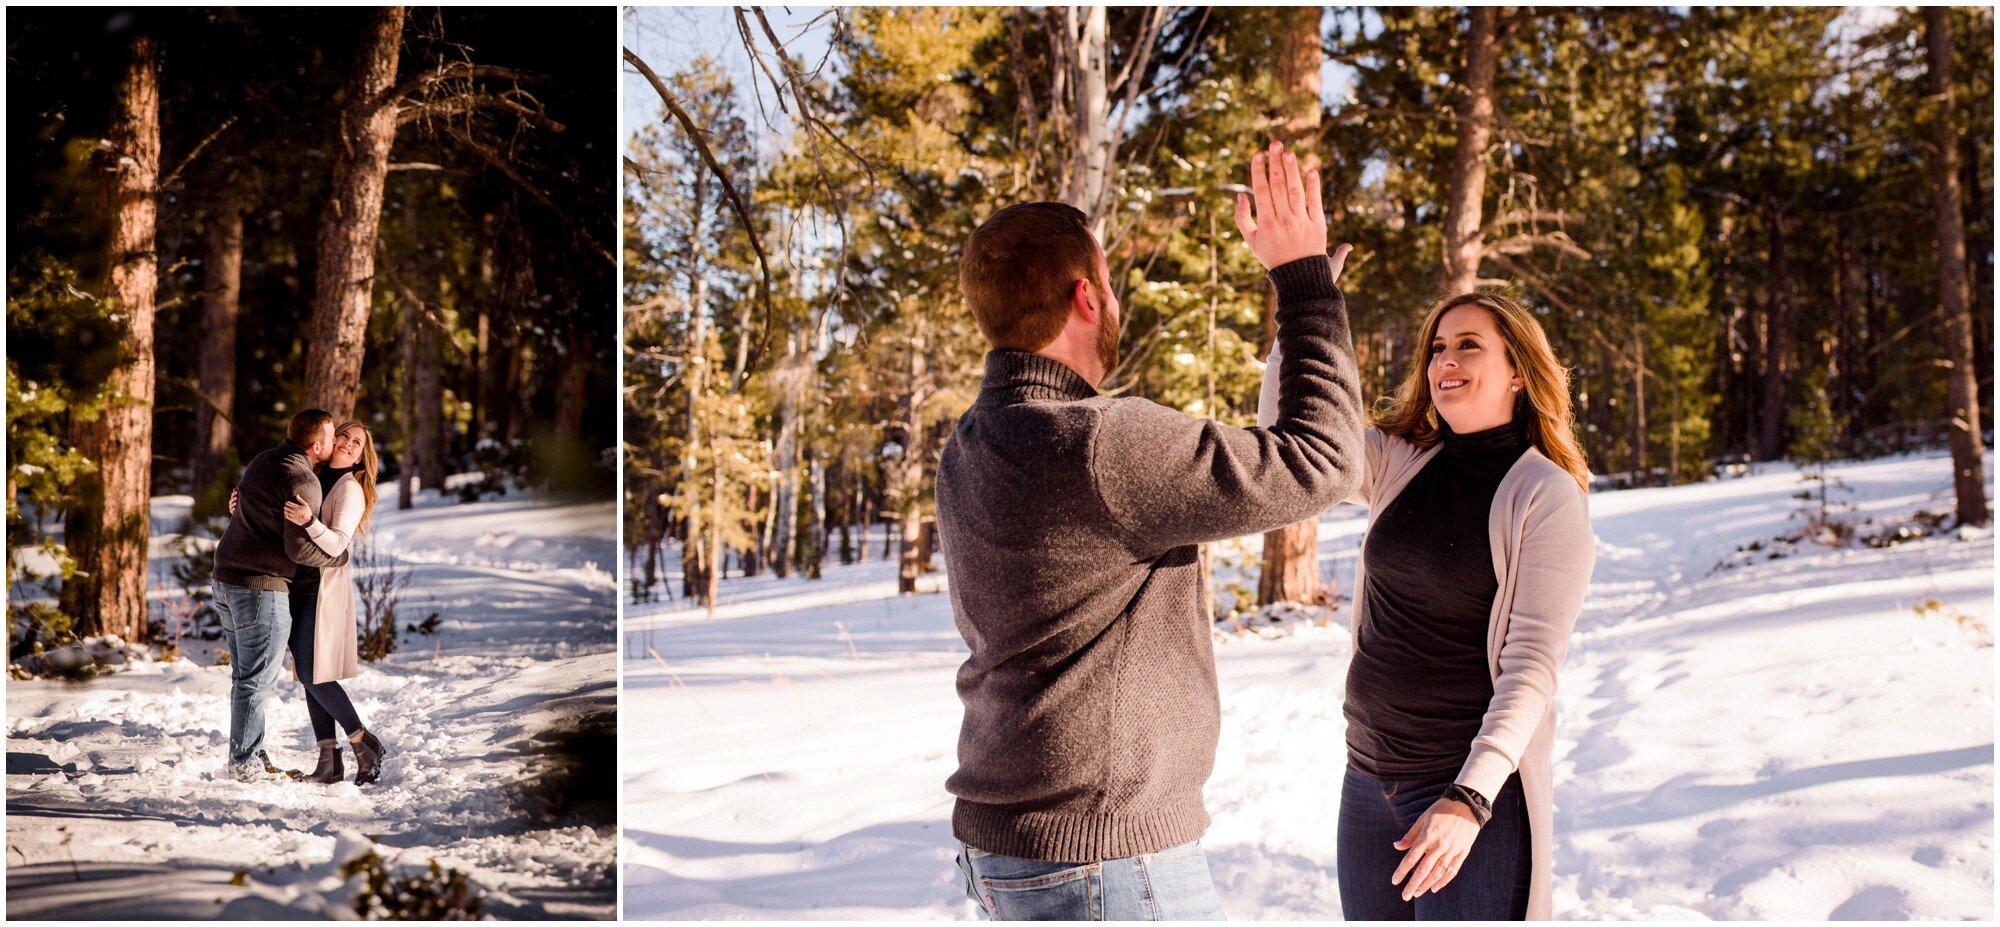 Evergreen-colorado-winter-engagement_0003.jpg